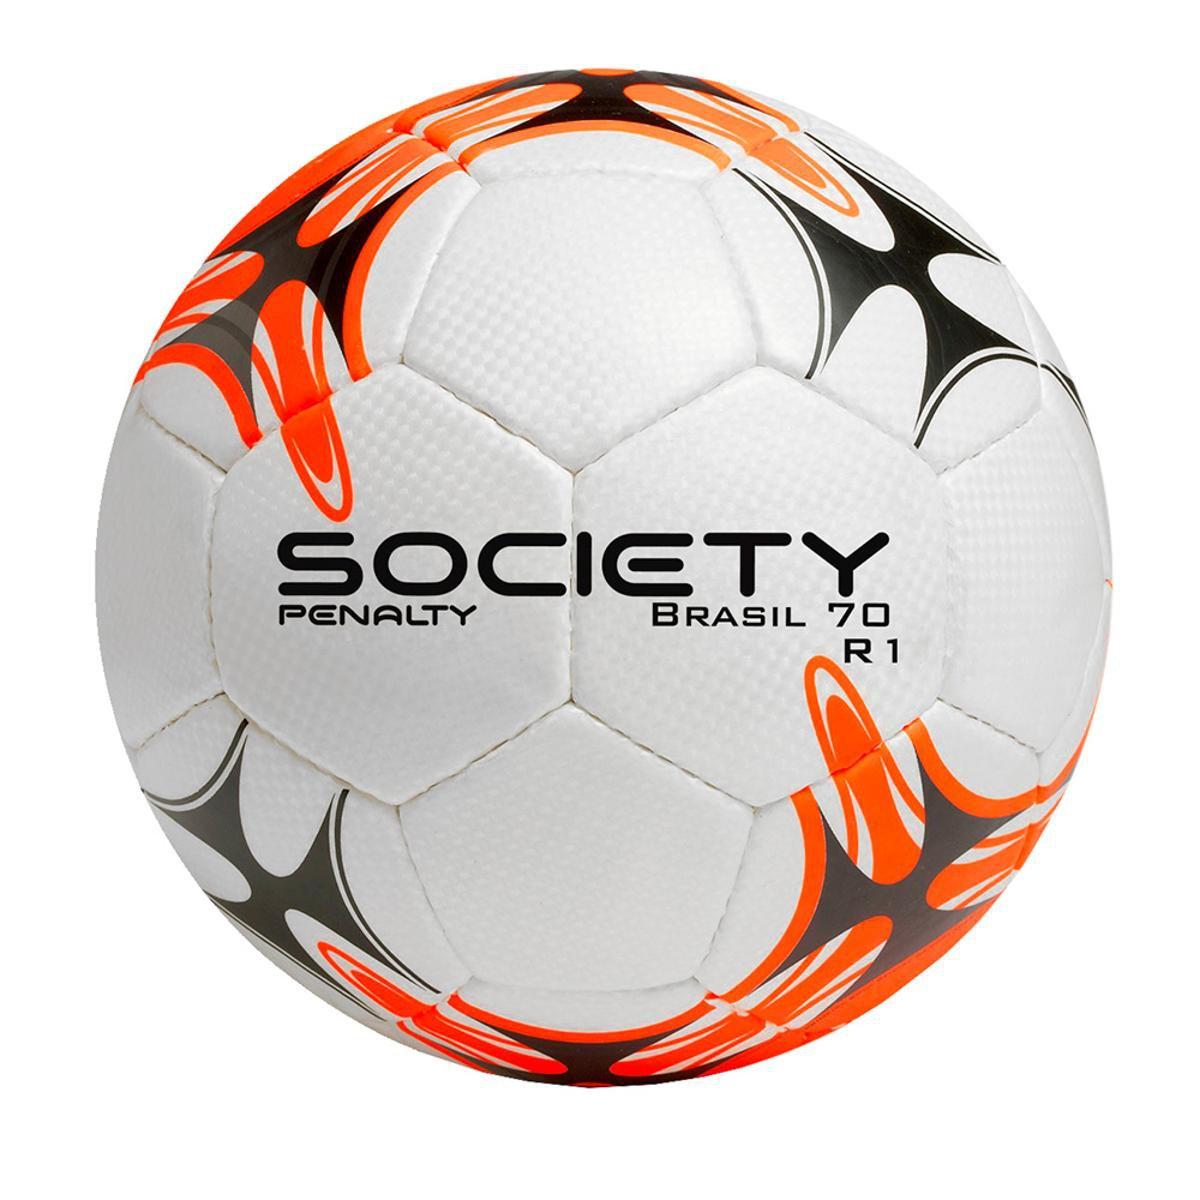 Bola Futebol Society Penalty Brasil 70 R1 - Branco e Laranja ... 9844a2e9418a1